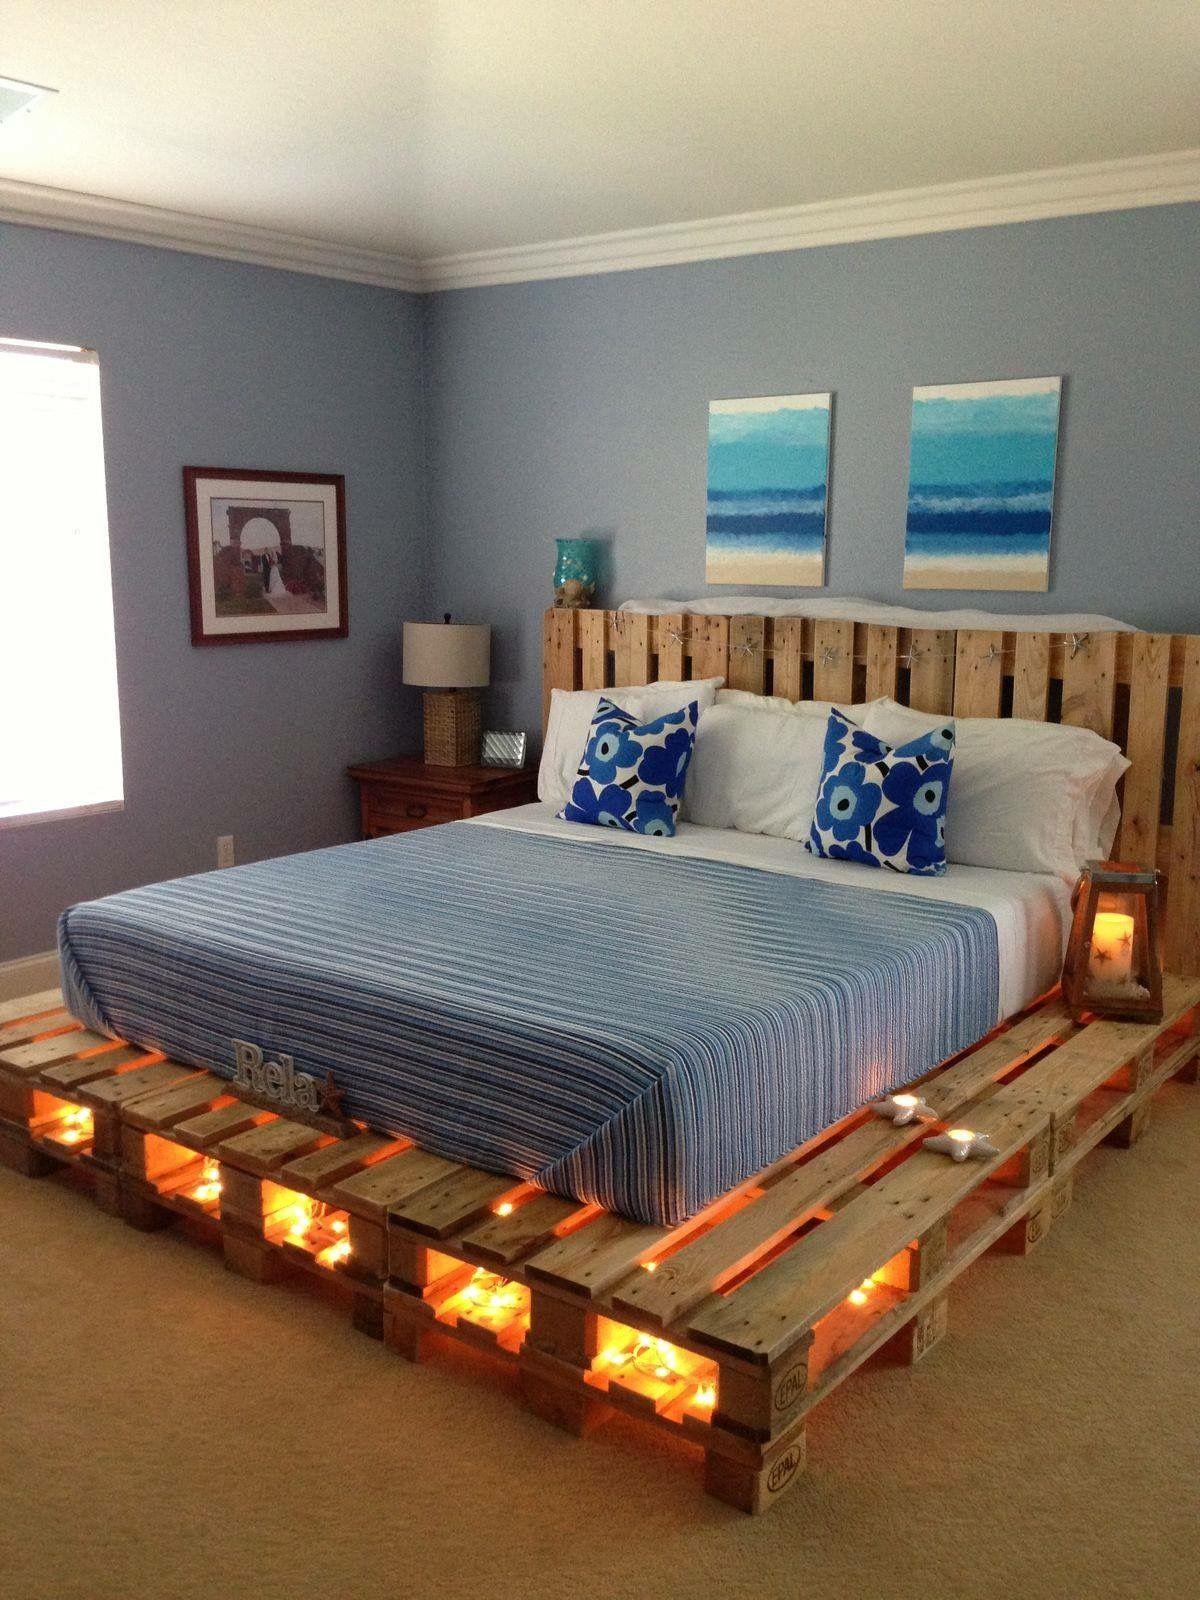 King size pallet bed Pallet bed with lights, Diy pallet